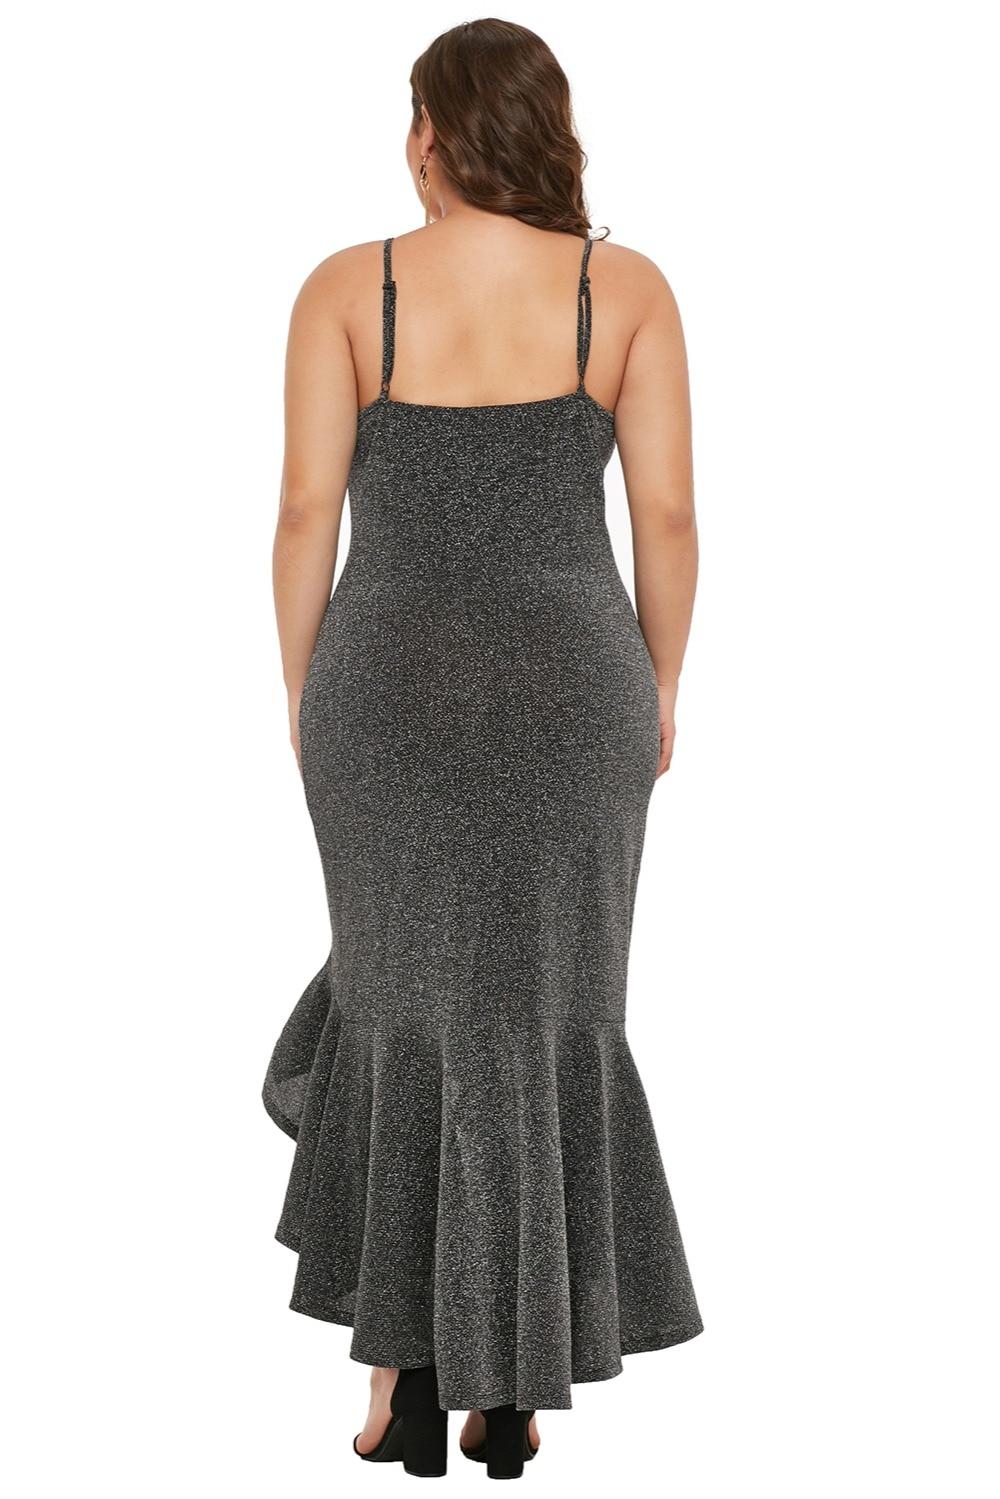 Charcoal-True-Shine-Plus-Size-High-low-Dress-LC610939-13-2